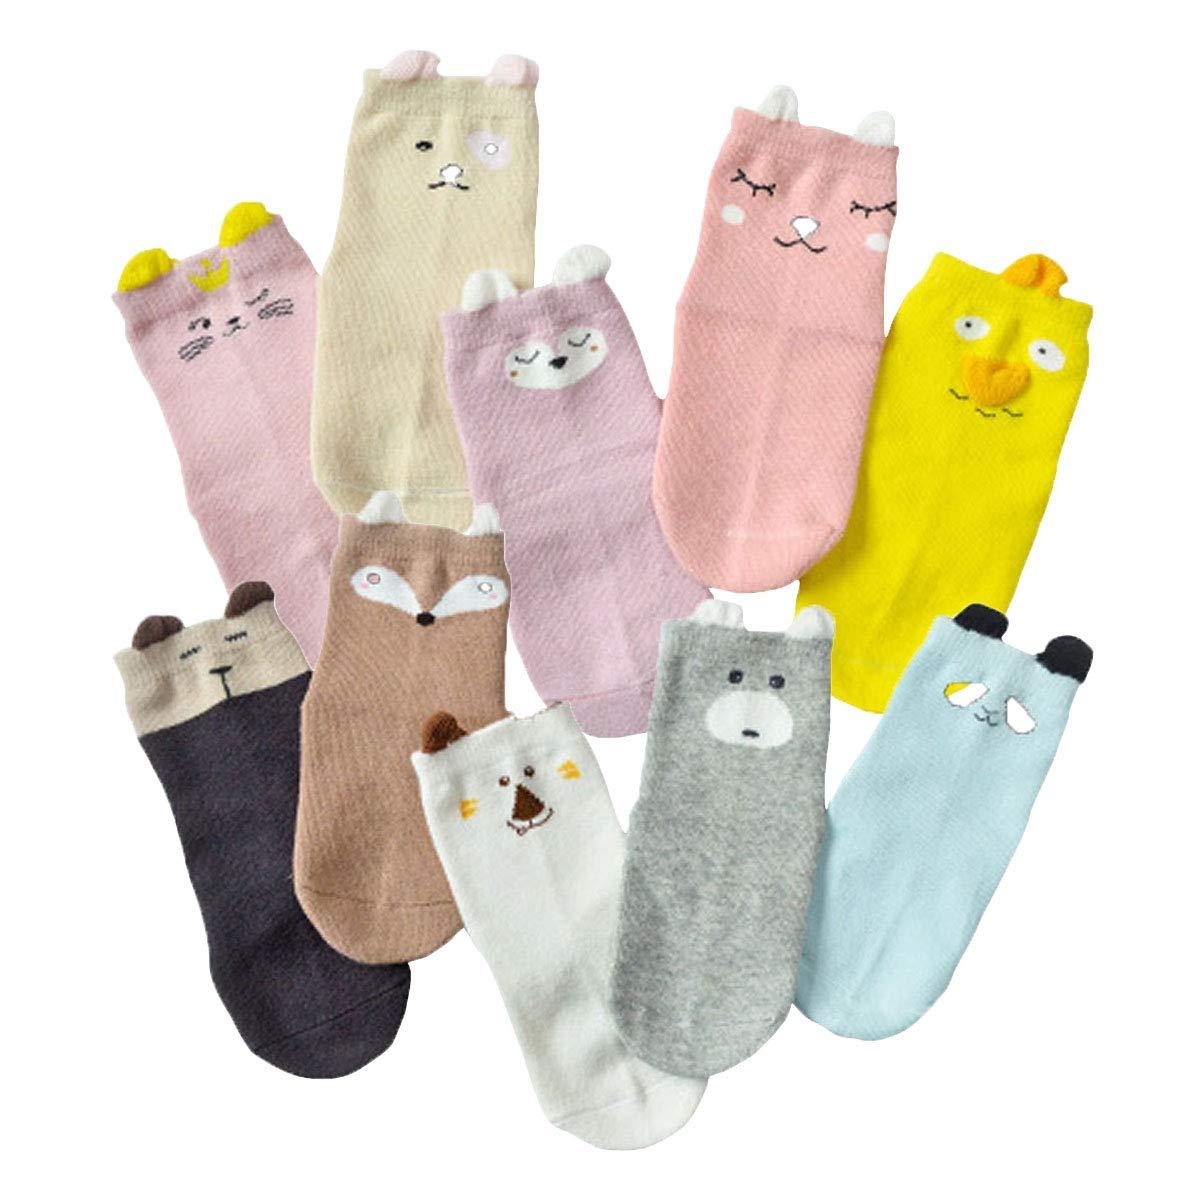 BoXianer Baby Sock Infant Toddler Boy Girl Newborn Cotton Kids Socks 0-4 Years